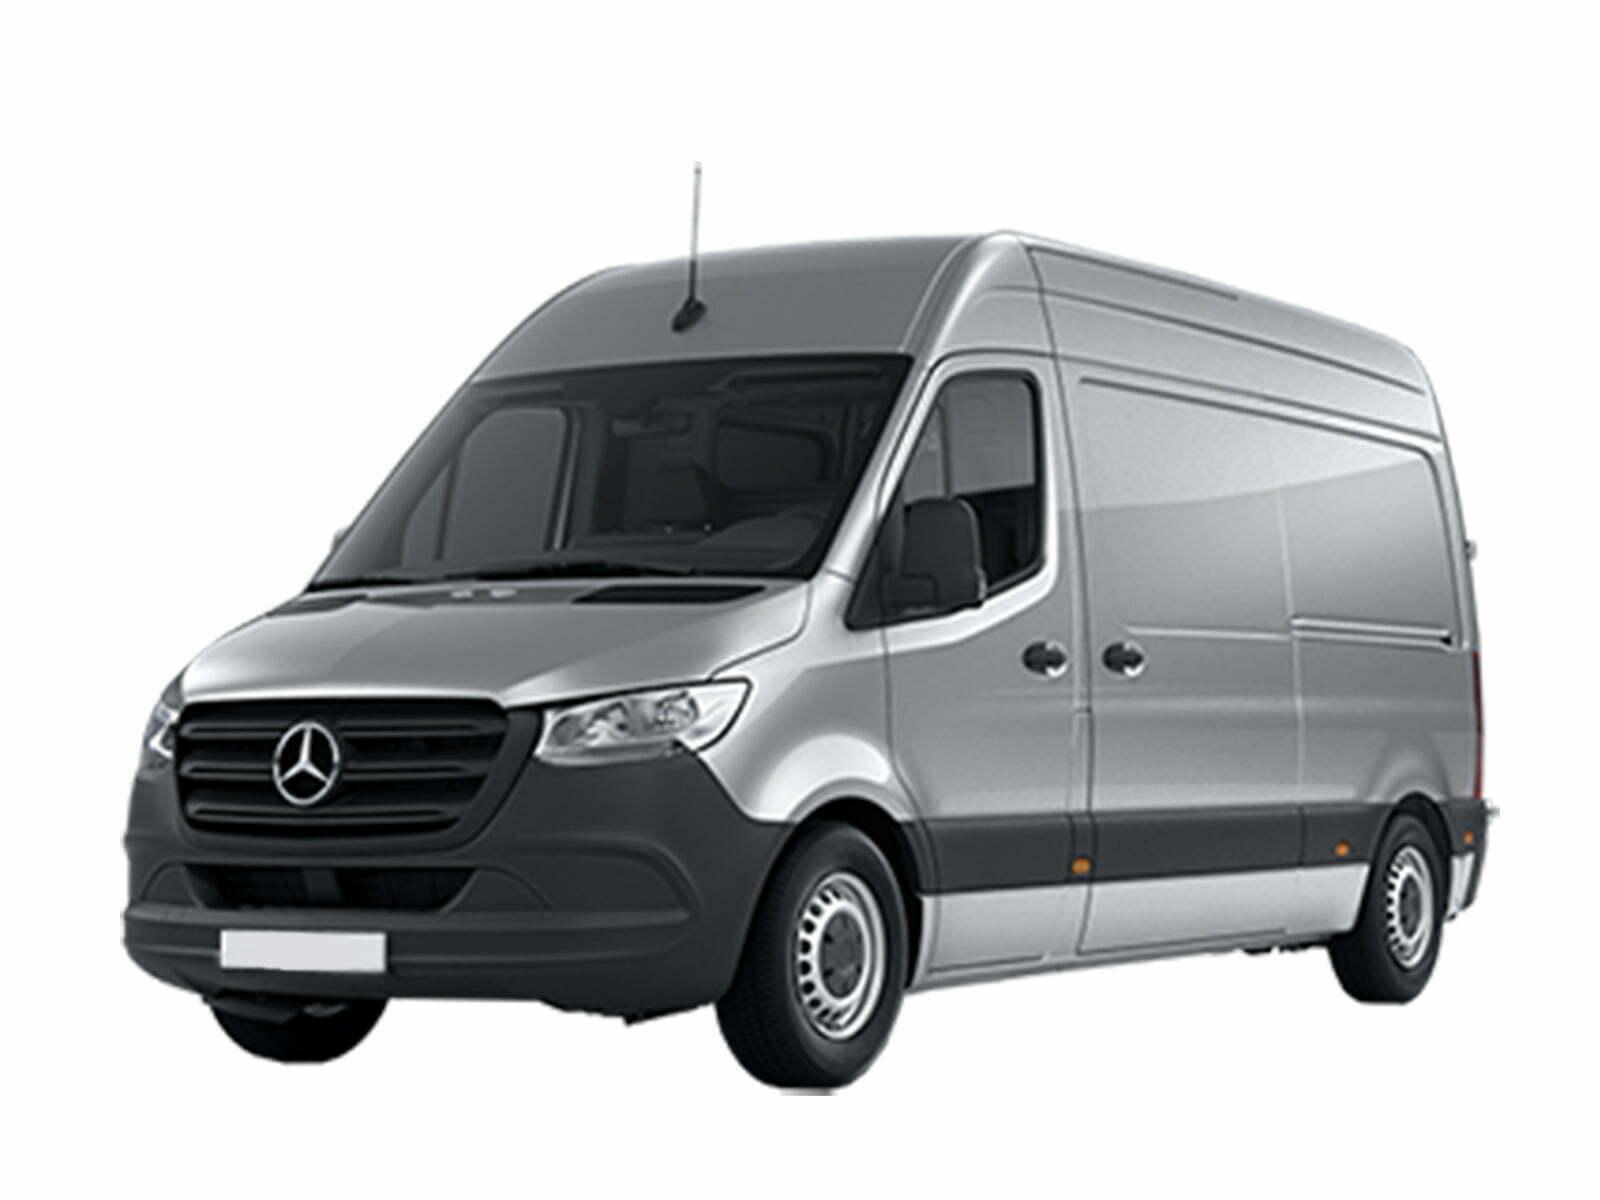 Mercedes-Benz Sprinter 211CDI L1H1 FWD 3.0t Functional 6 4d.